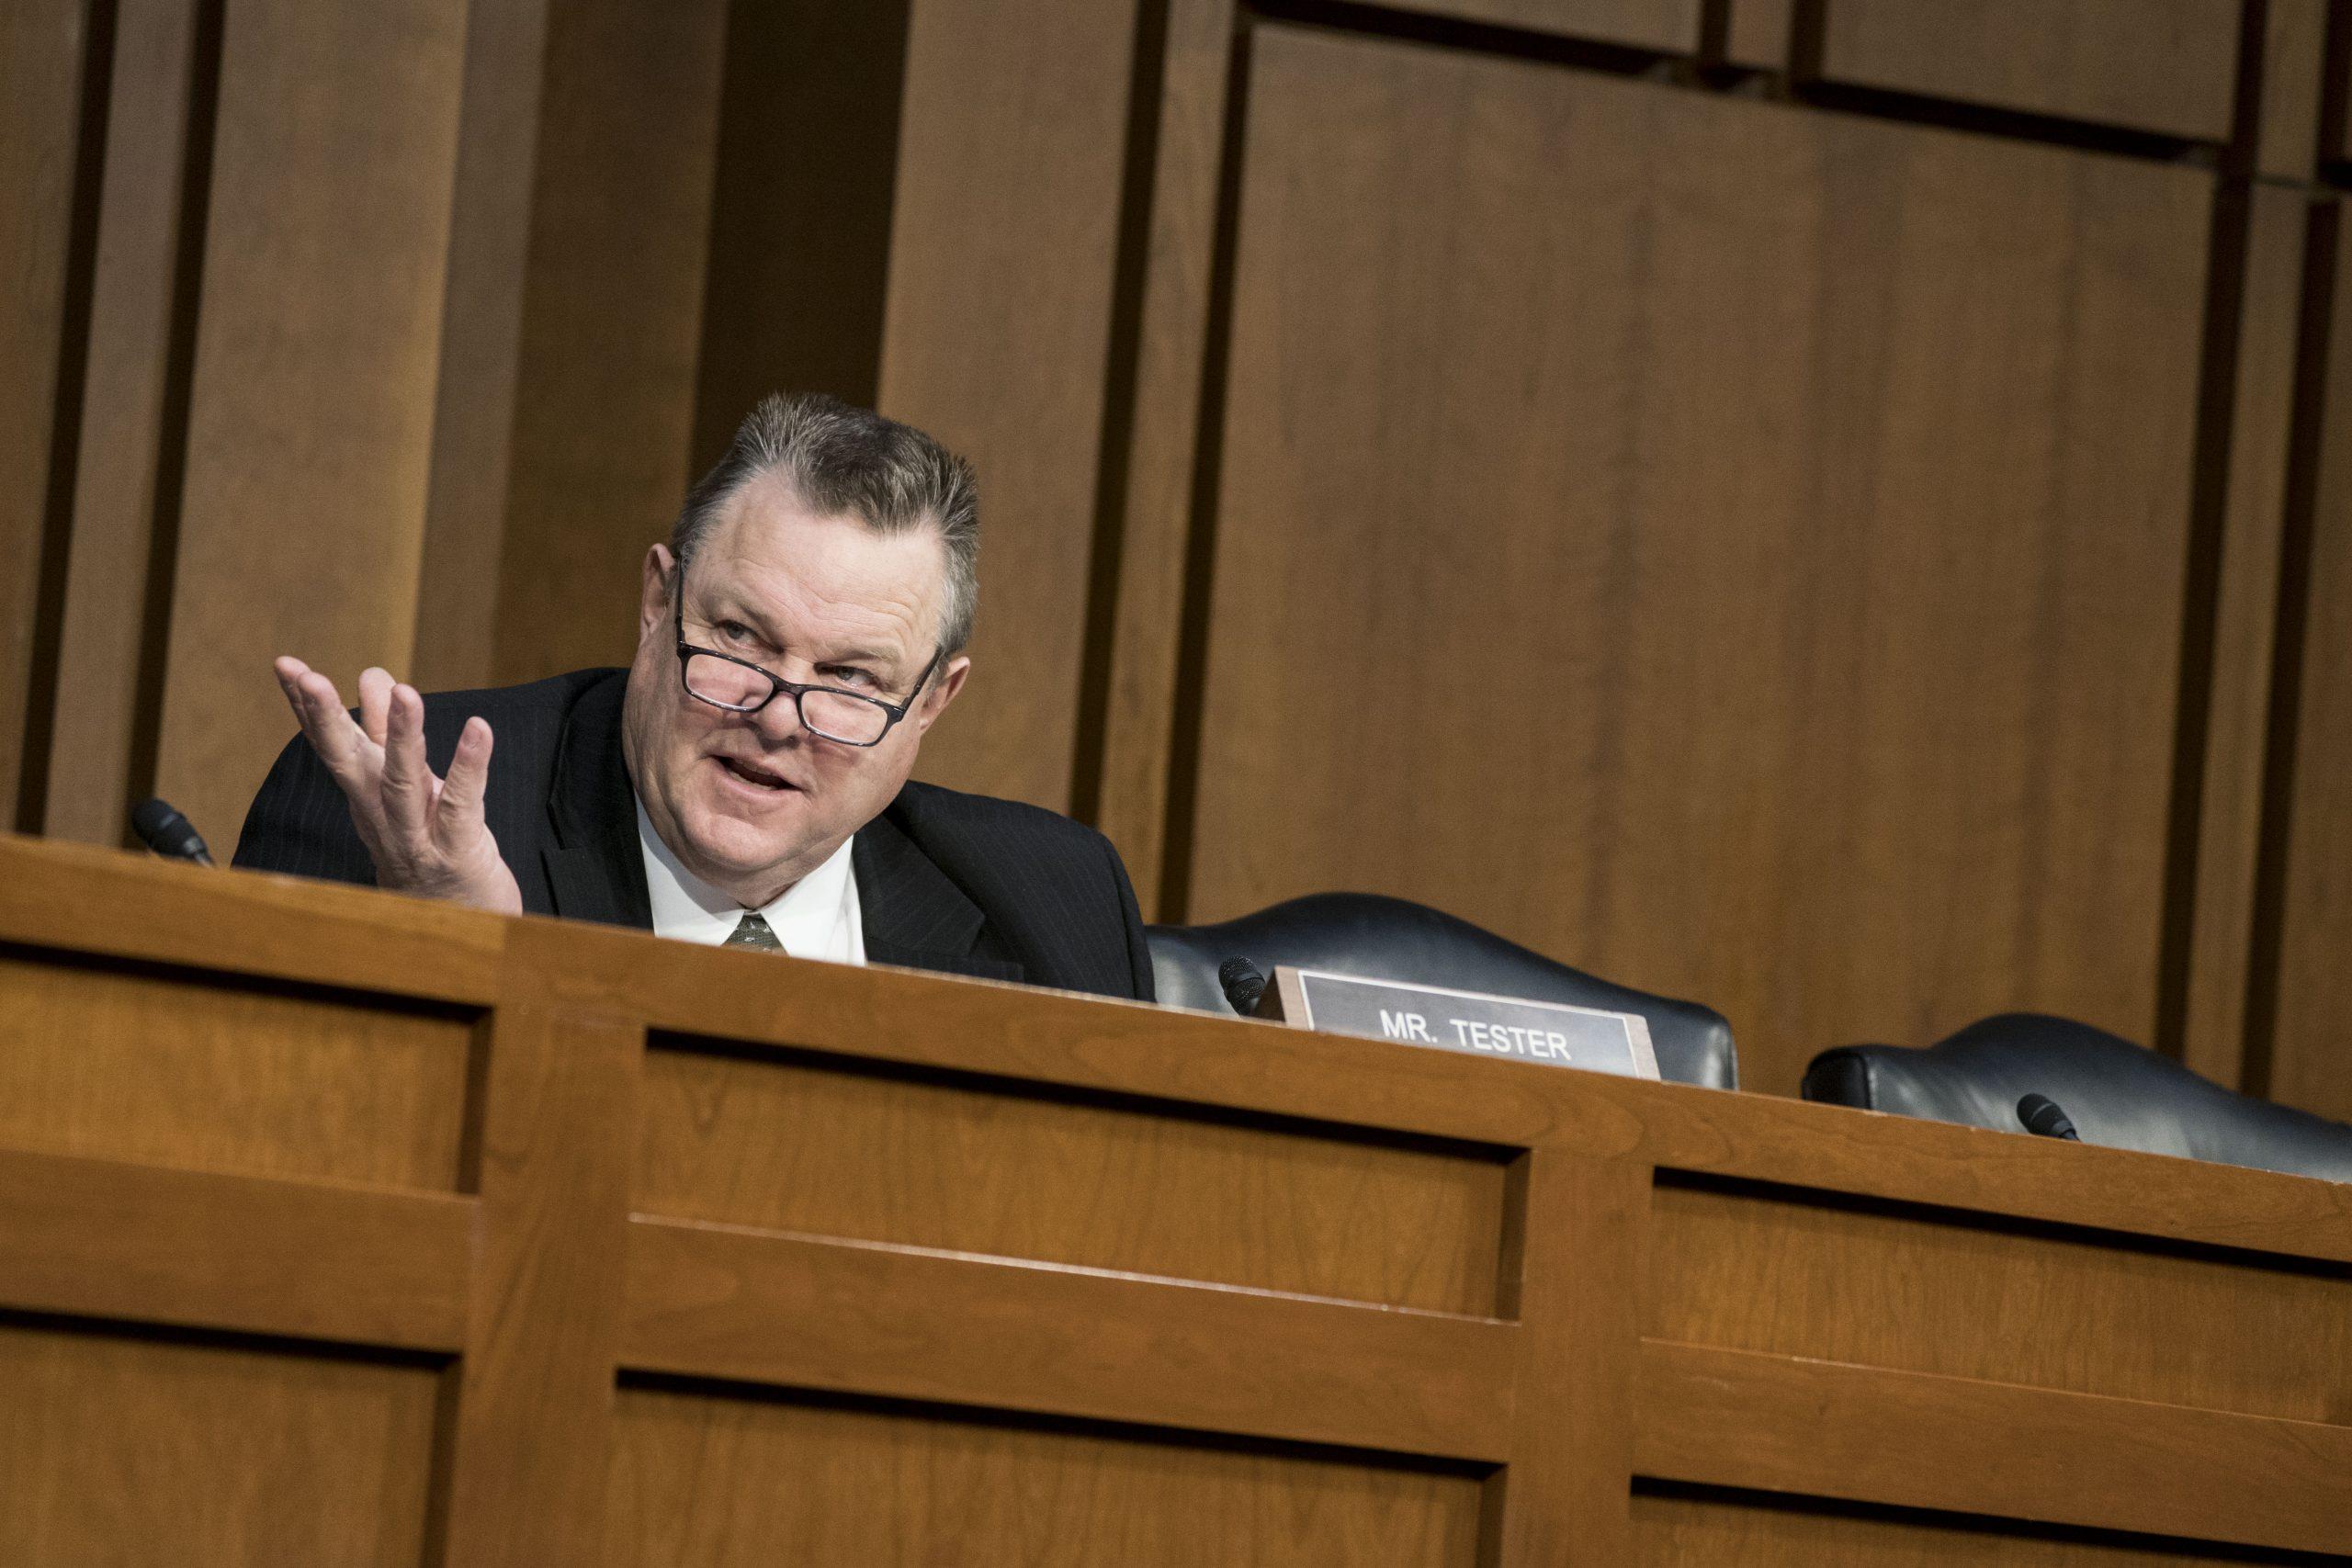 Sen. Jon Tester says 'putting folks back to work' is priority